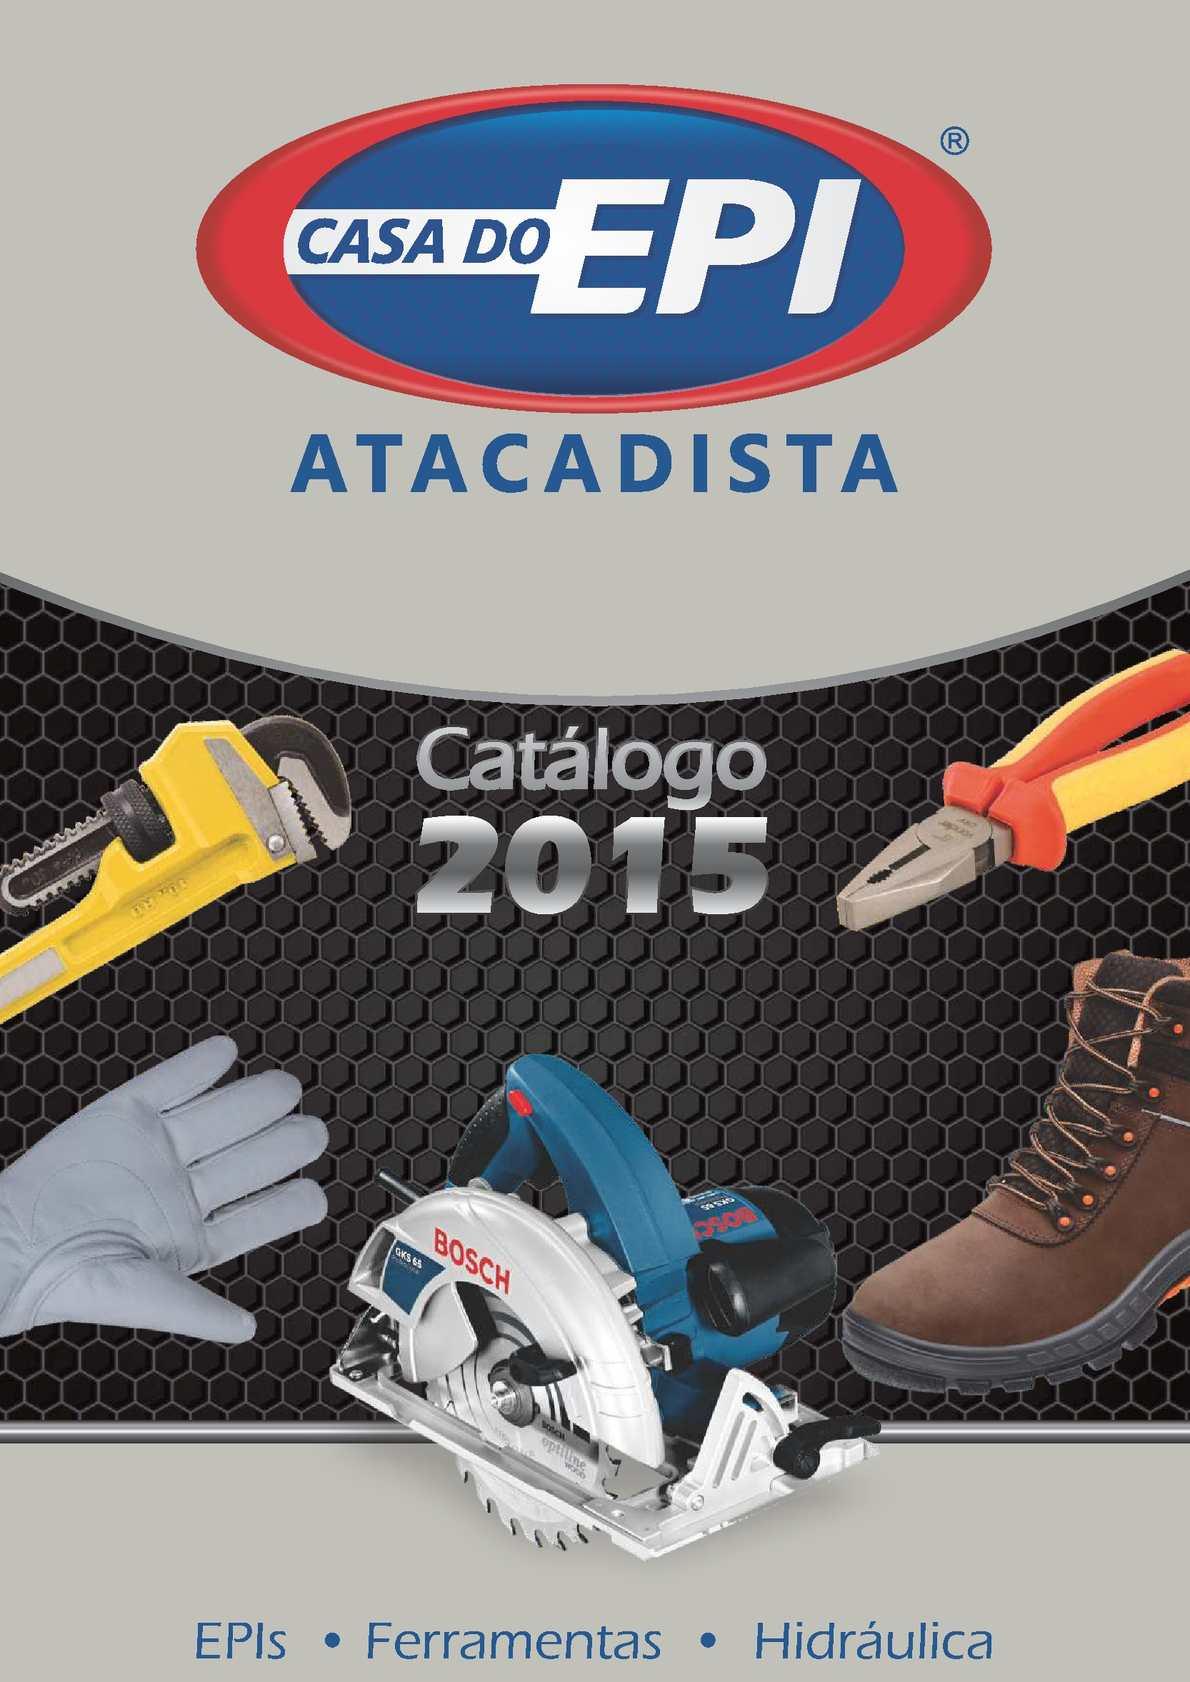 Calaméo - Catálogo de Produtos Casa do EPI 2015 93d2bbfeed